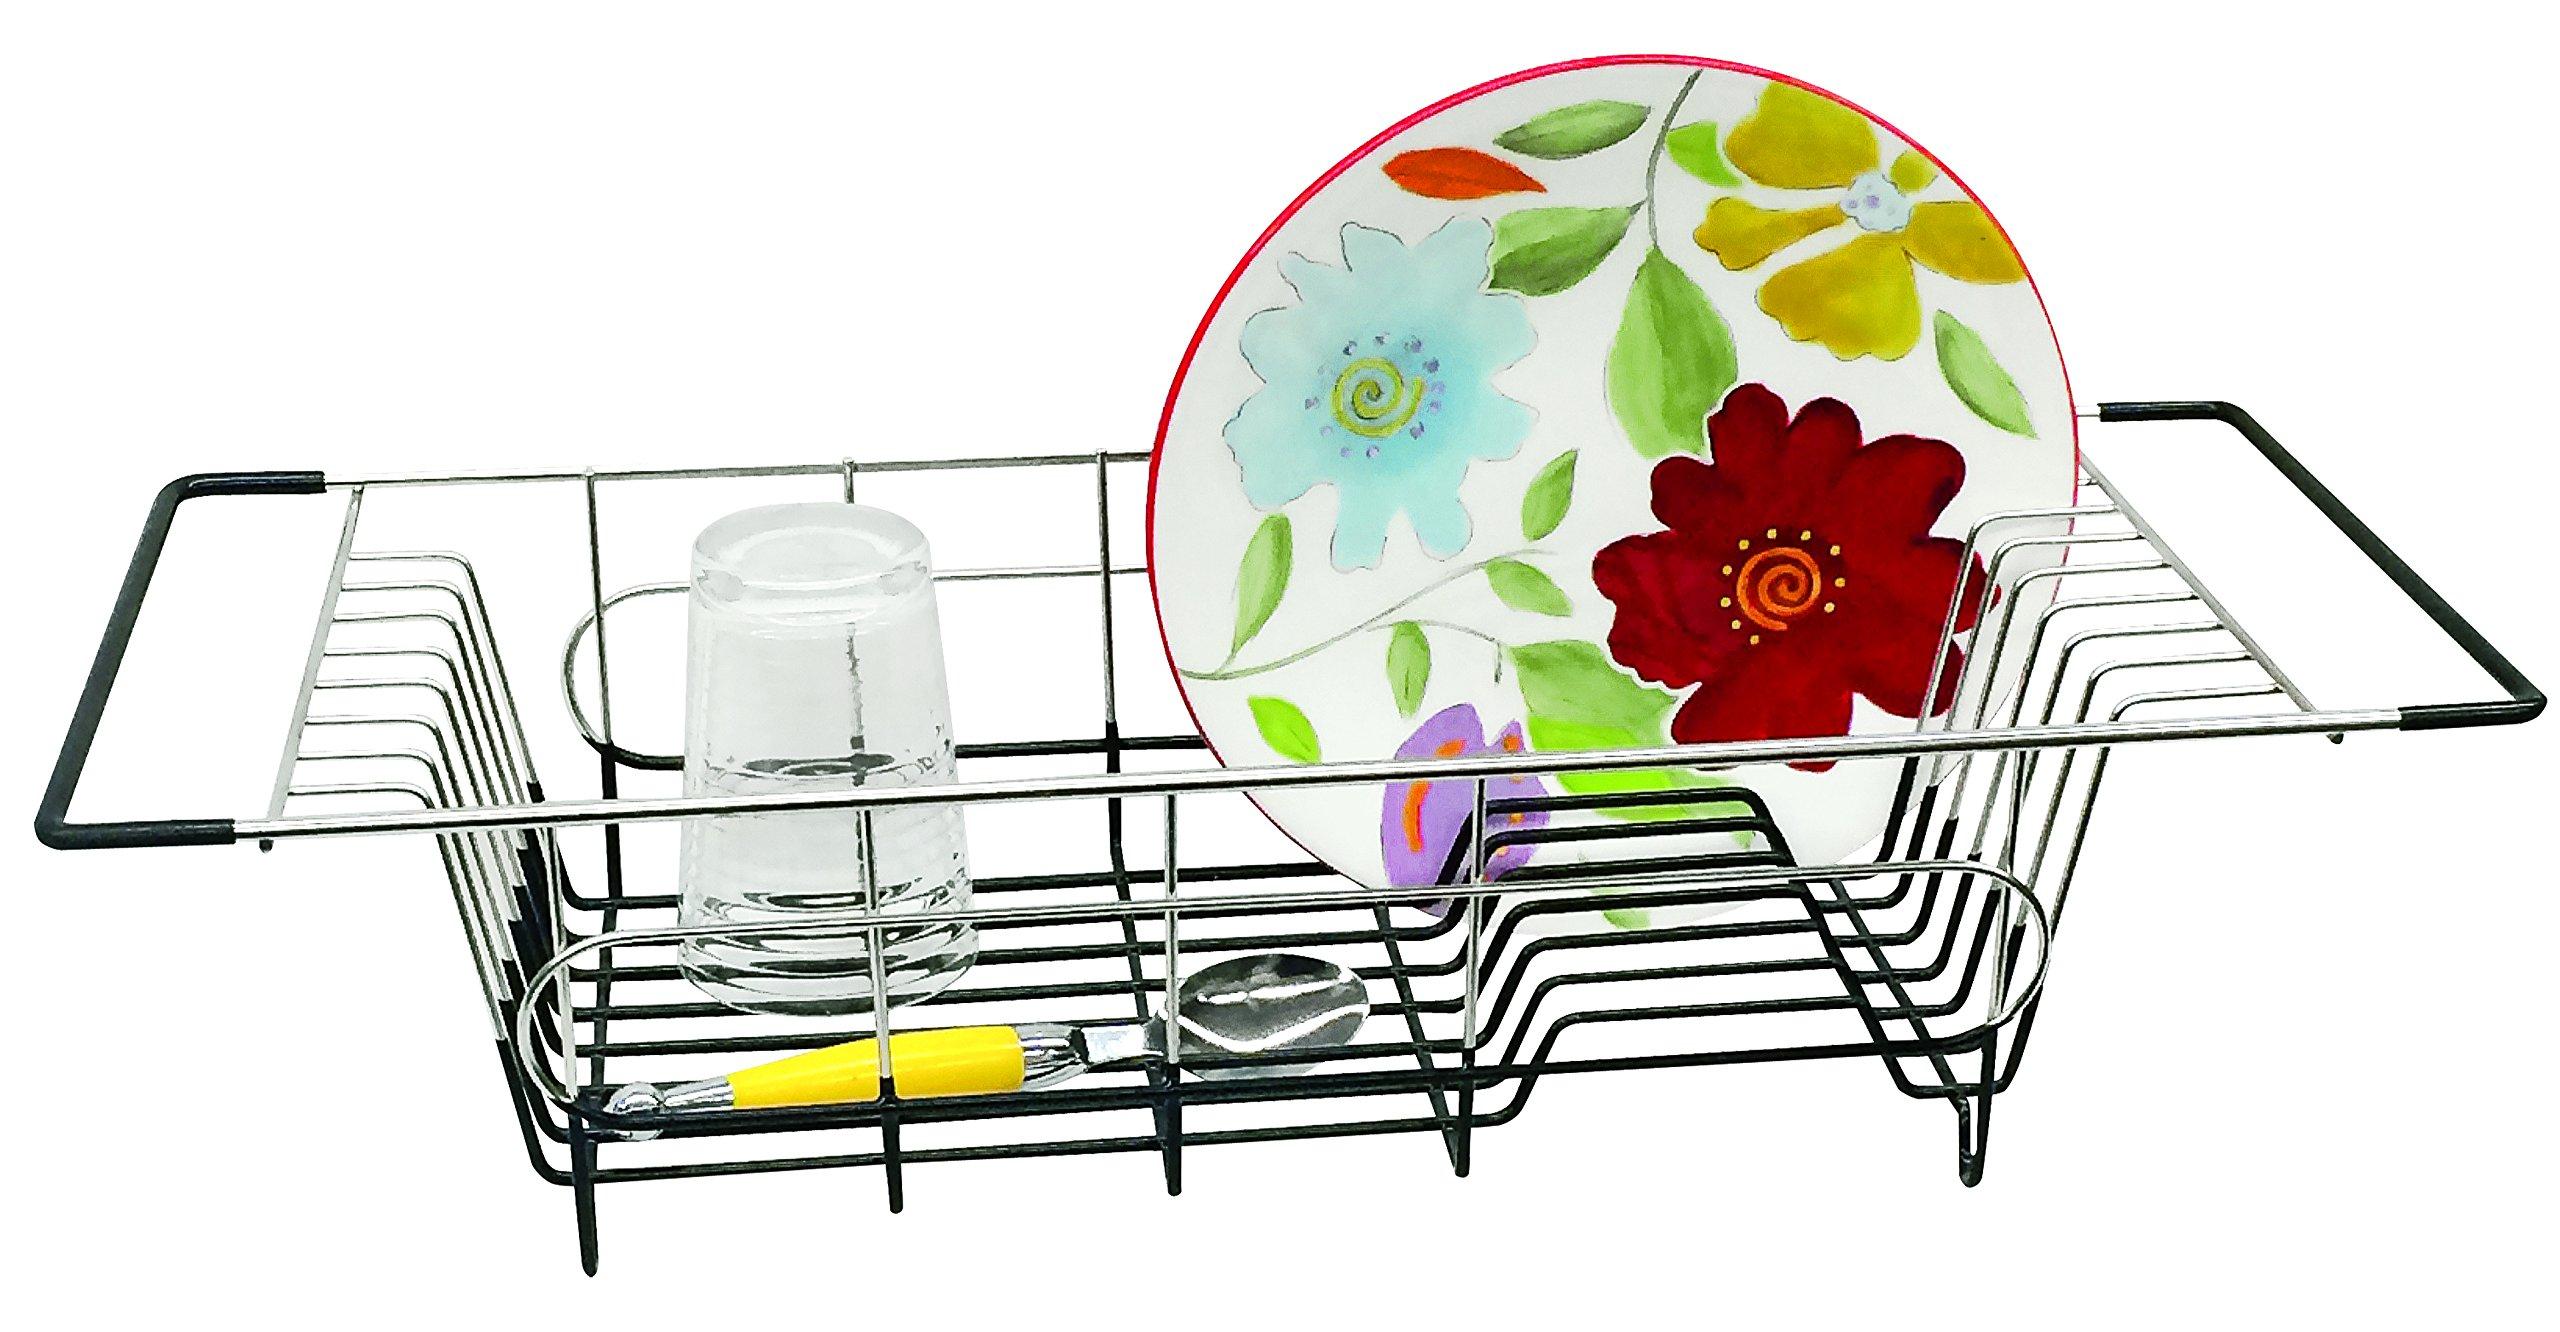 Space Saving Dish Rack Over Sink Dish Rack Stainless Steel Dishwasher Safe Space Saving